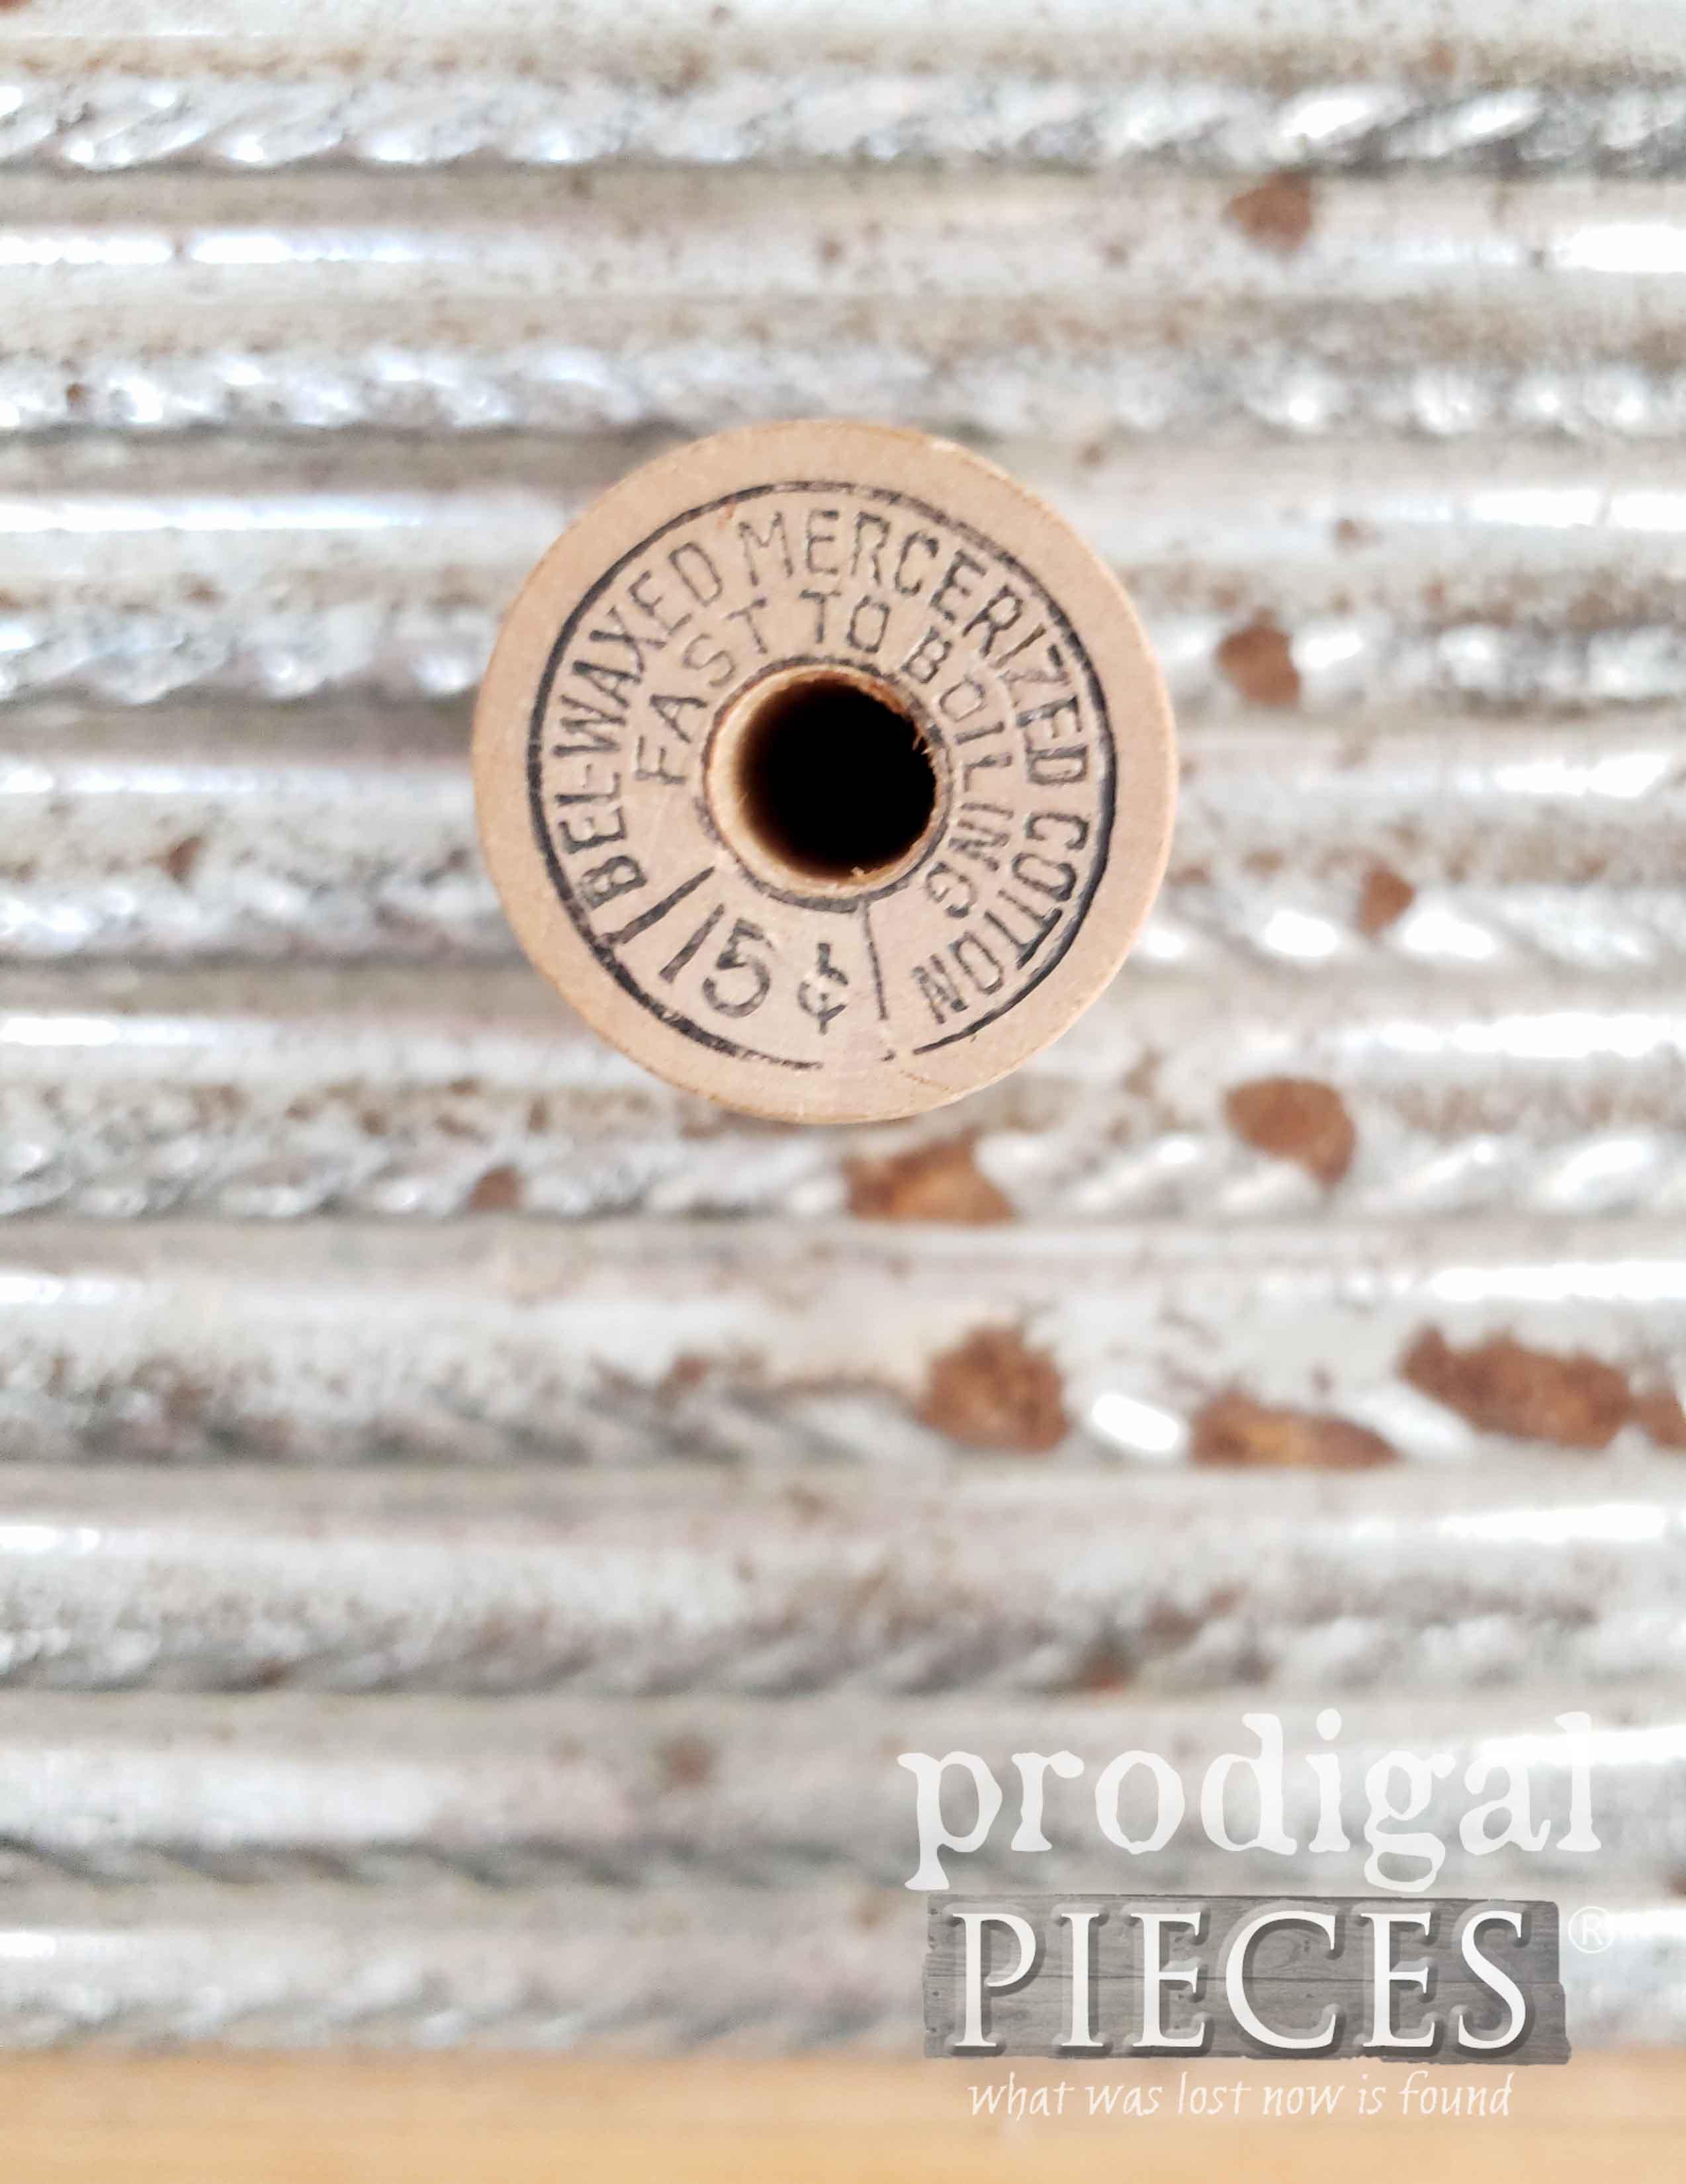 Vintage Wooden Thread Spool with Embossed Design   Prodigal Pieces   prodigalpieces.com #prodigalpieces #vintage #retro #sewing